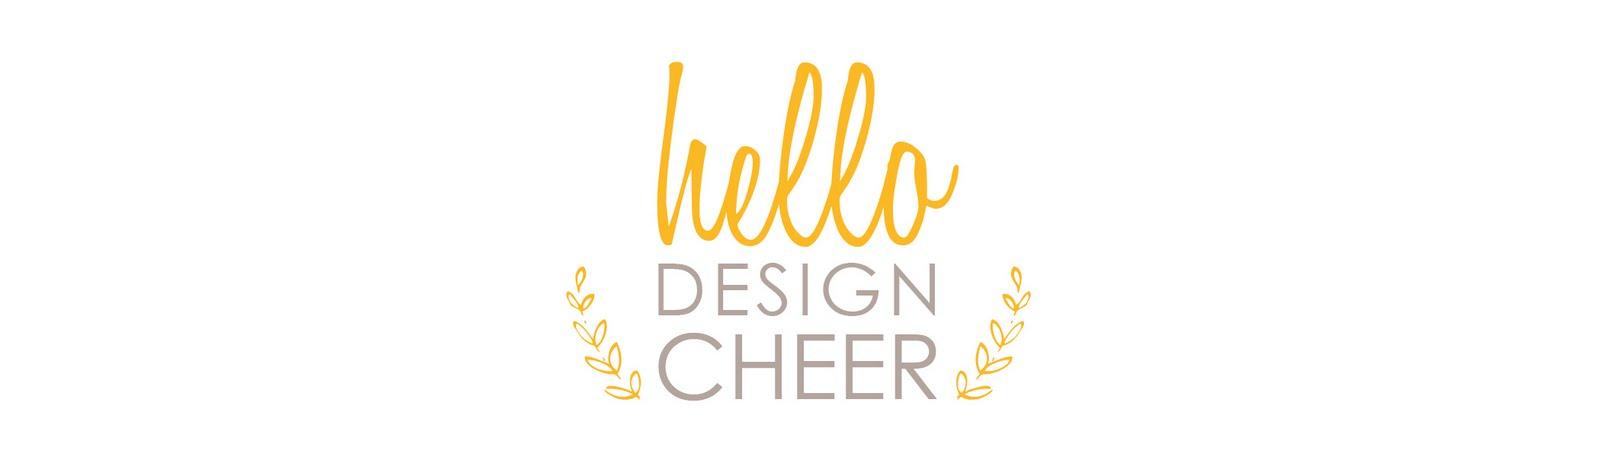 Hello Design Cheer